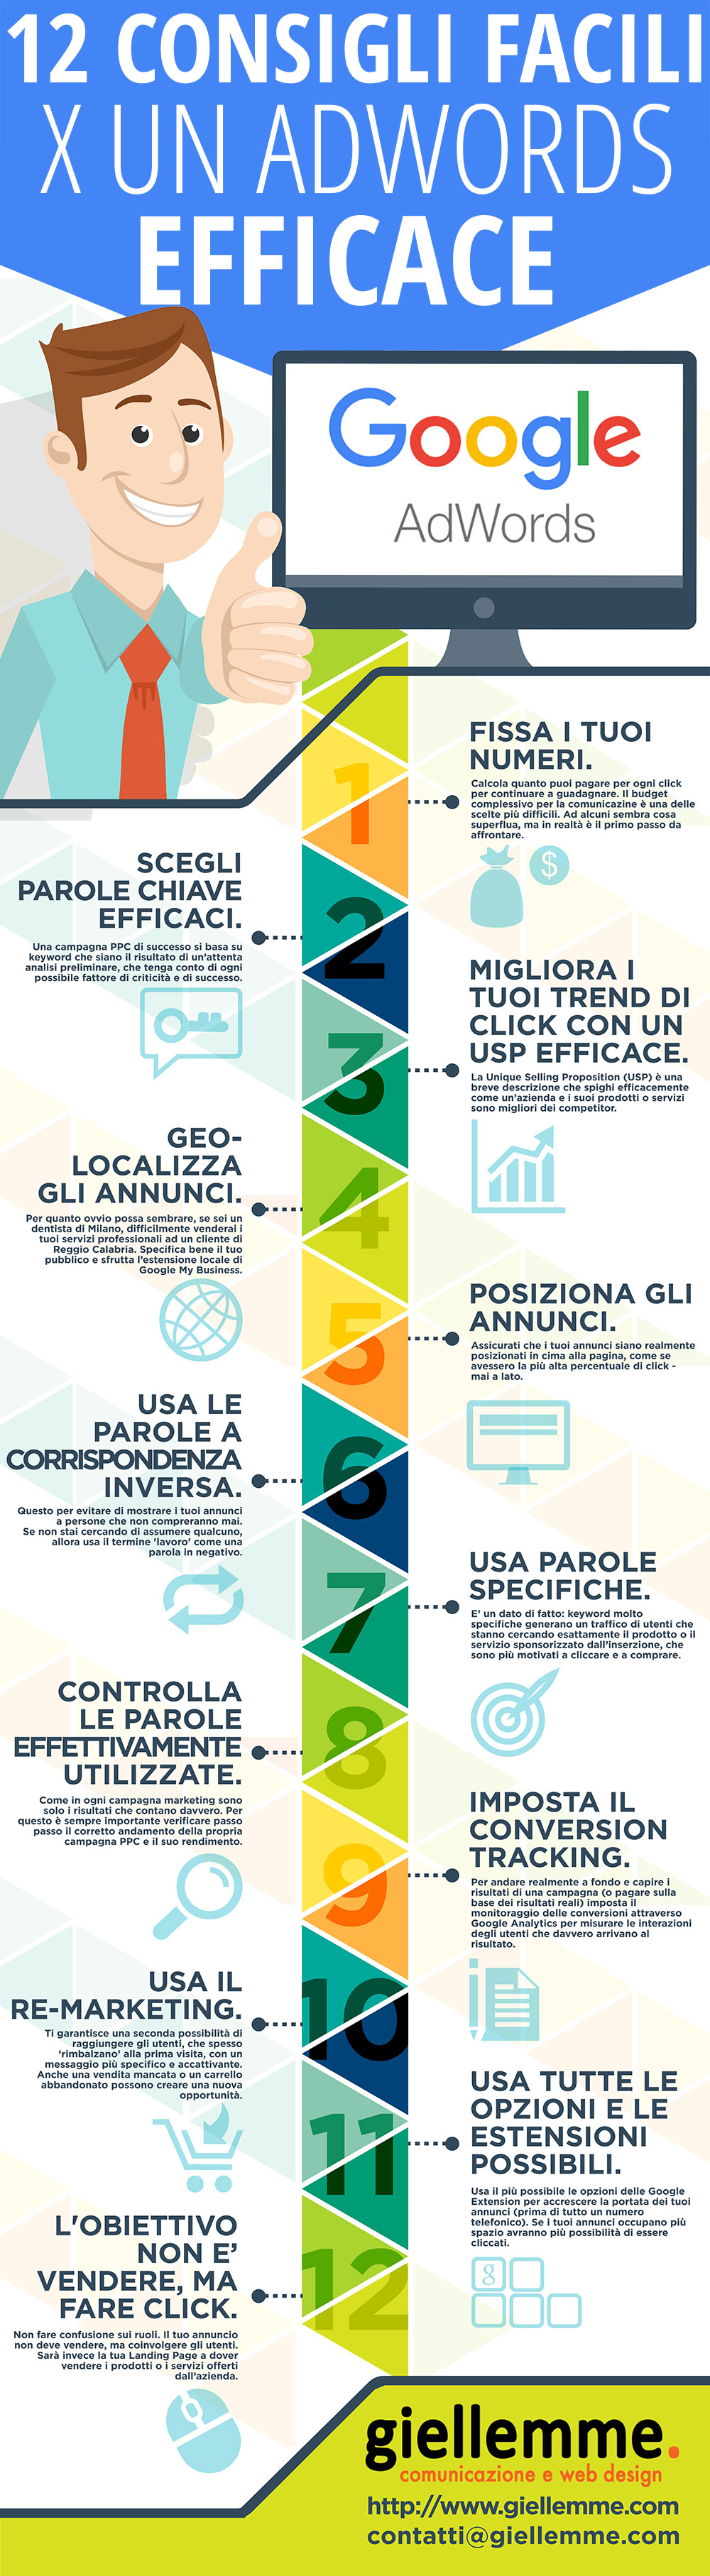 infografica-12-consigli-adwords-efficace